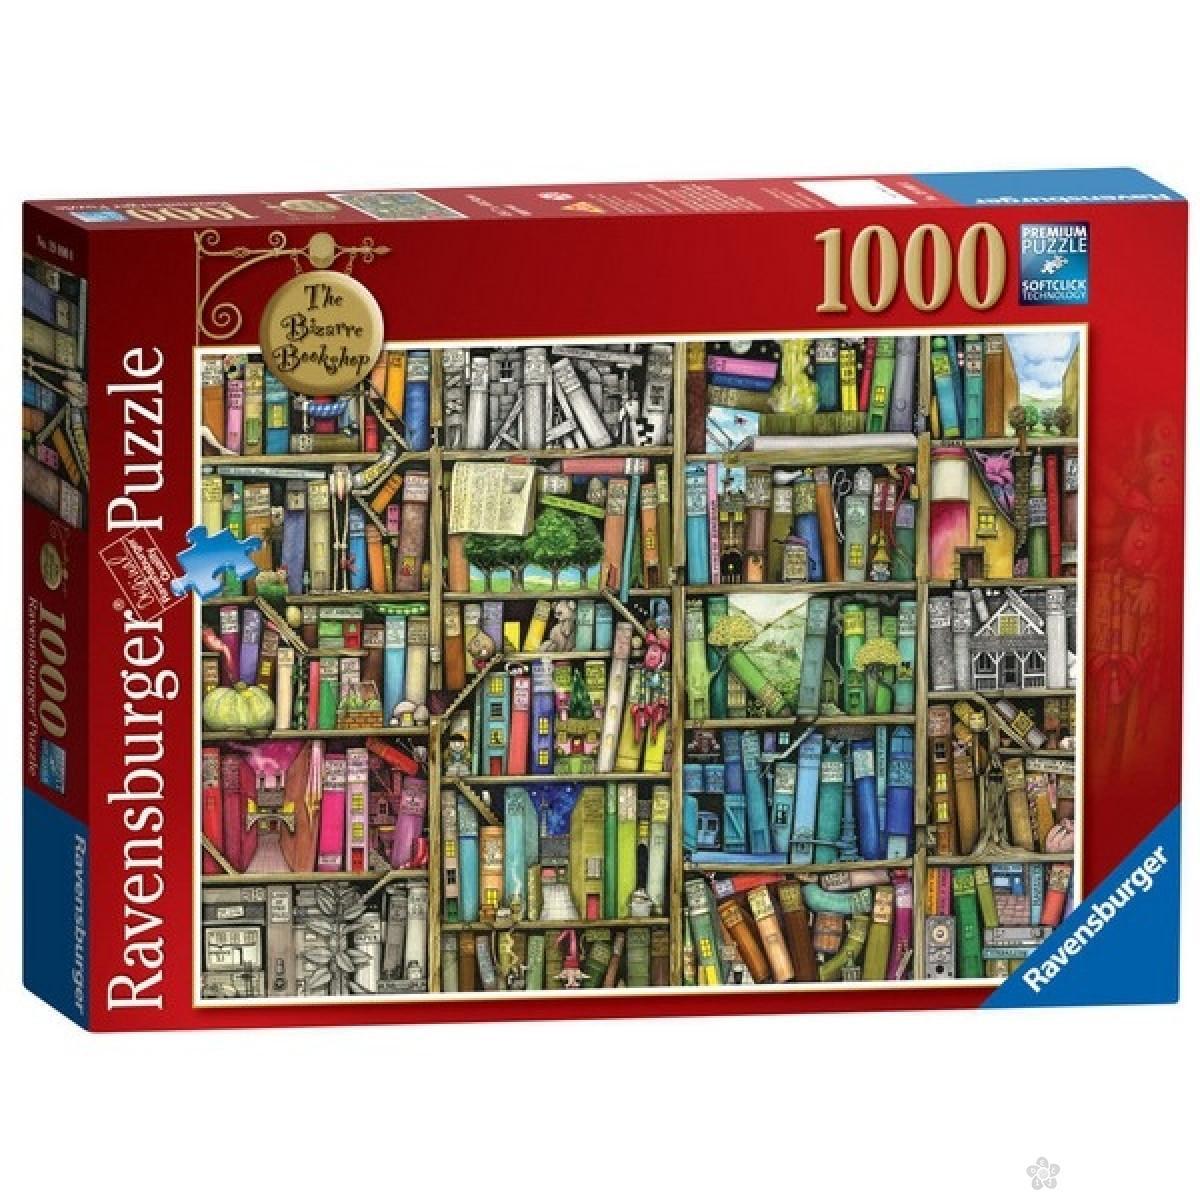 Ravensburger puzzle The Bizzarre Bookshop  RA19226